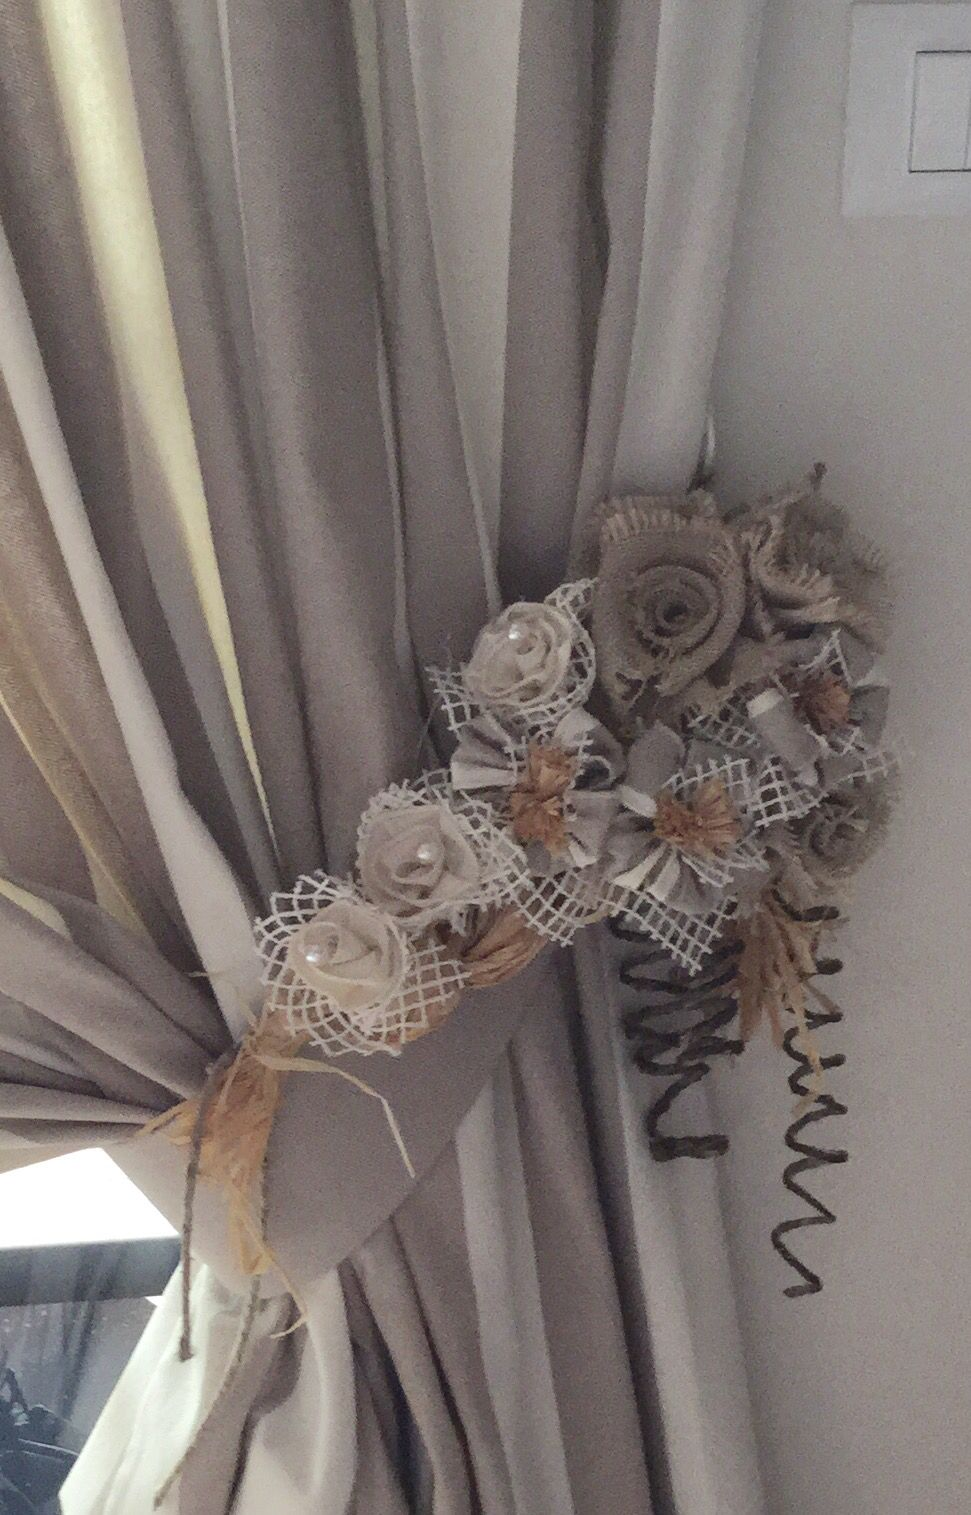 embrasse joliment d coor e embrases pinterest couture rideaux embrase et embrasse rideau. Black Bedroom Furniture Sets. Home Design Ideas